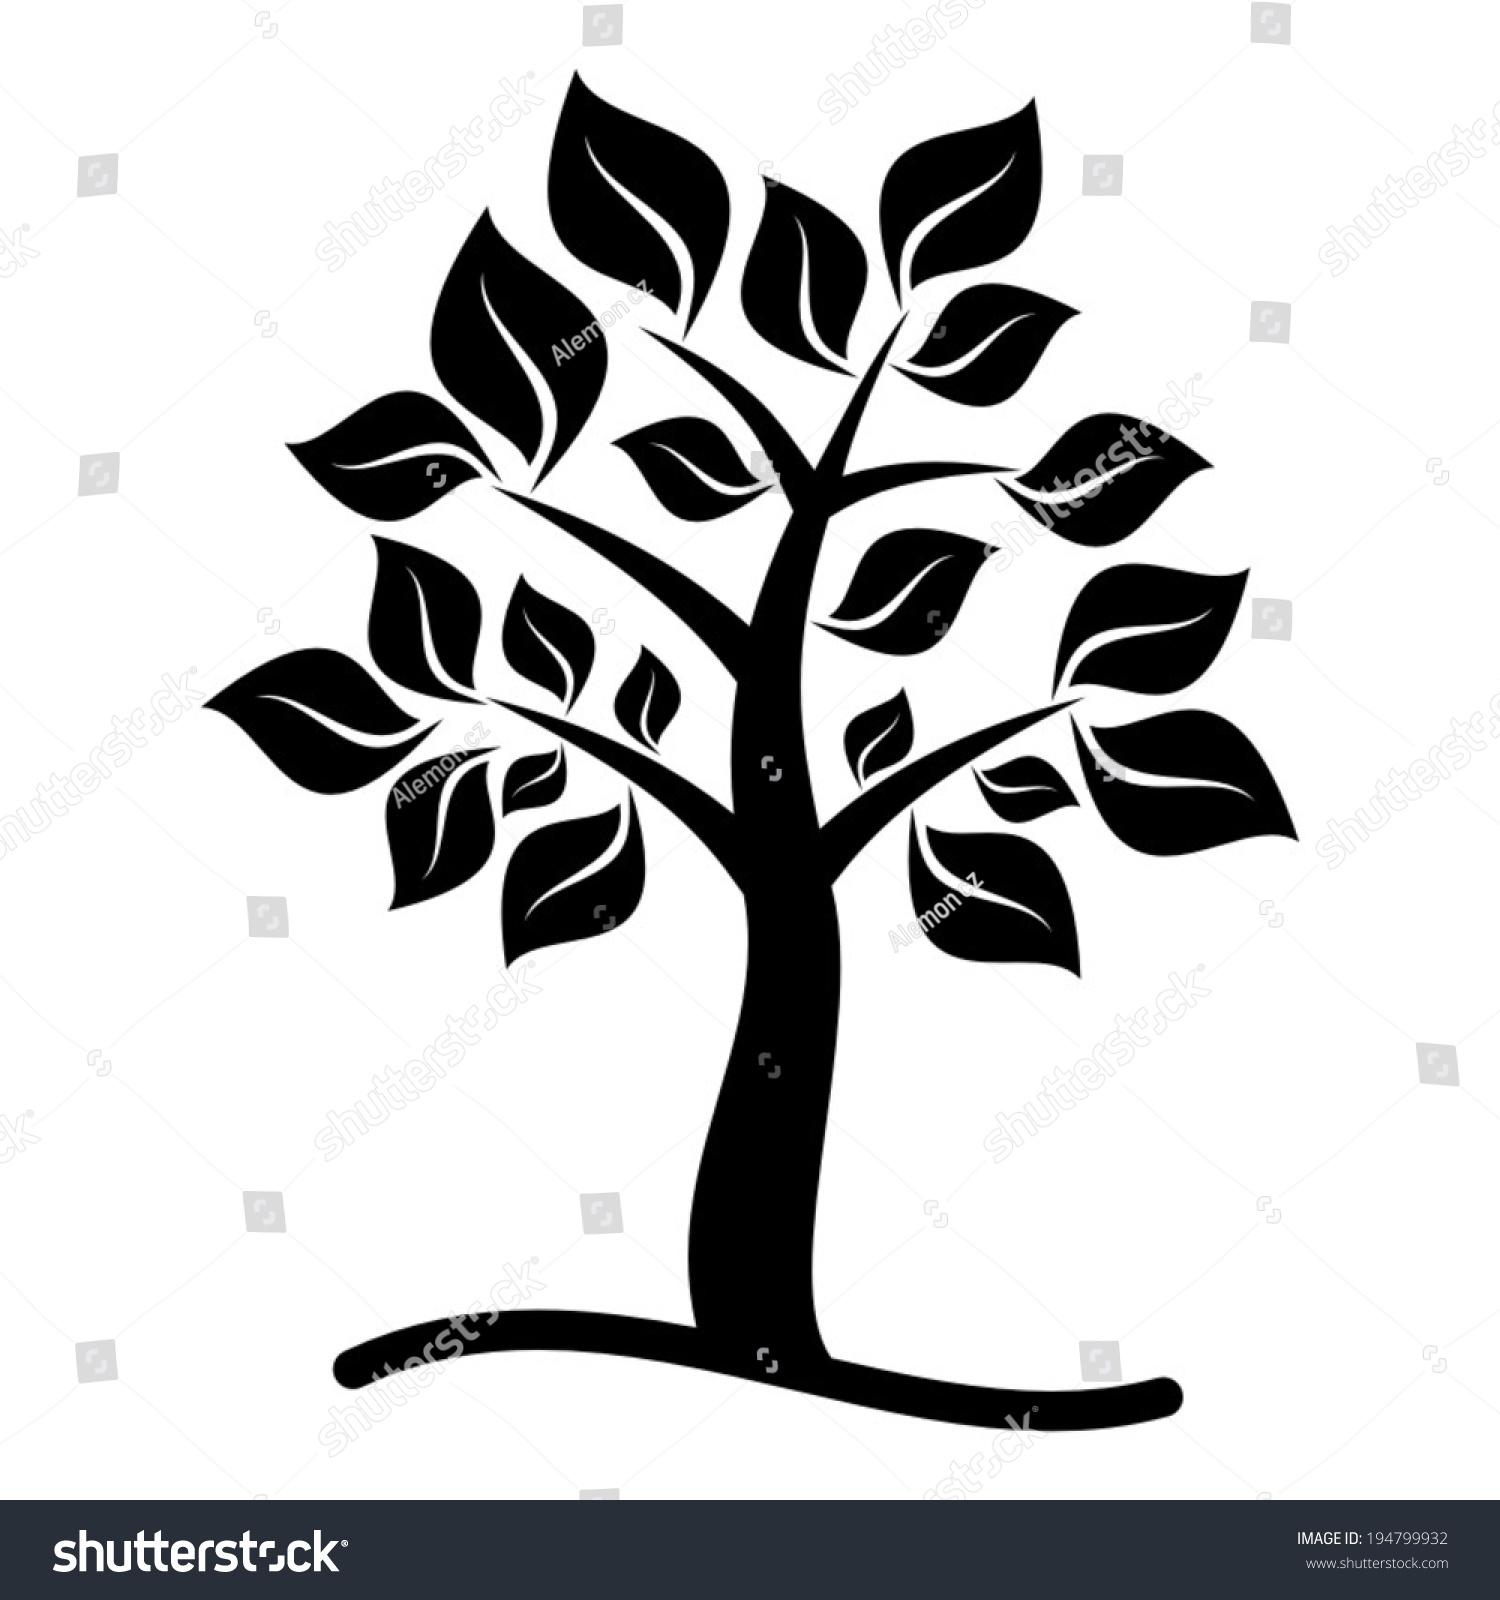 Tree Icon Black | www.imgkid.com - The Image Kid Has It!